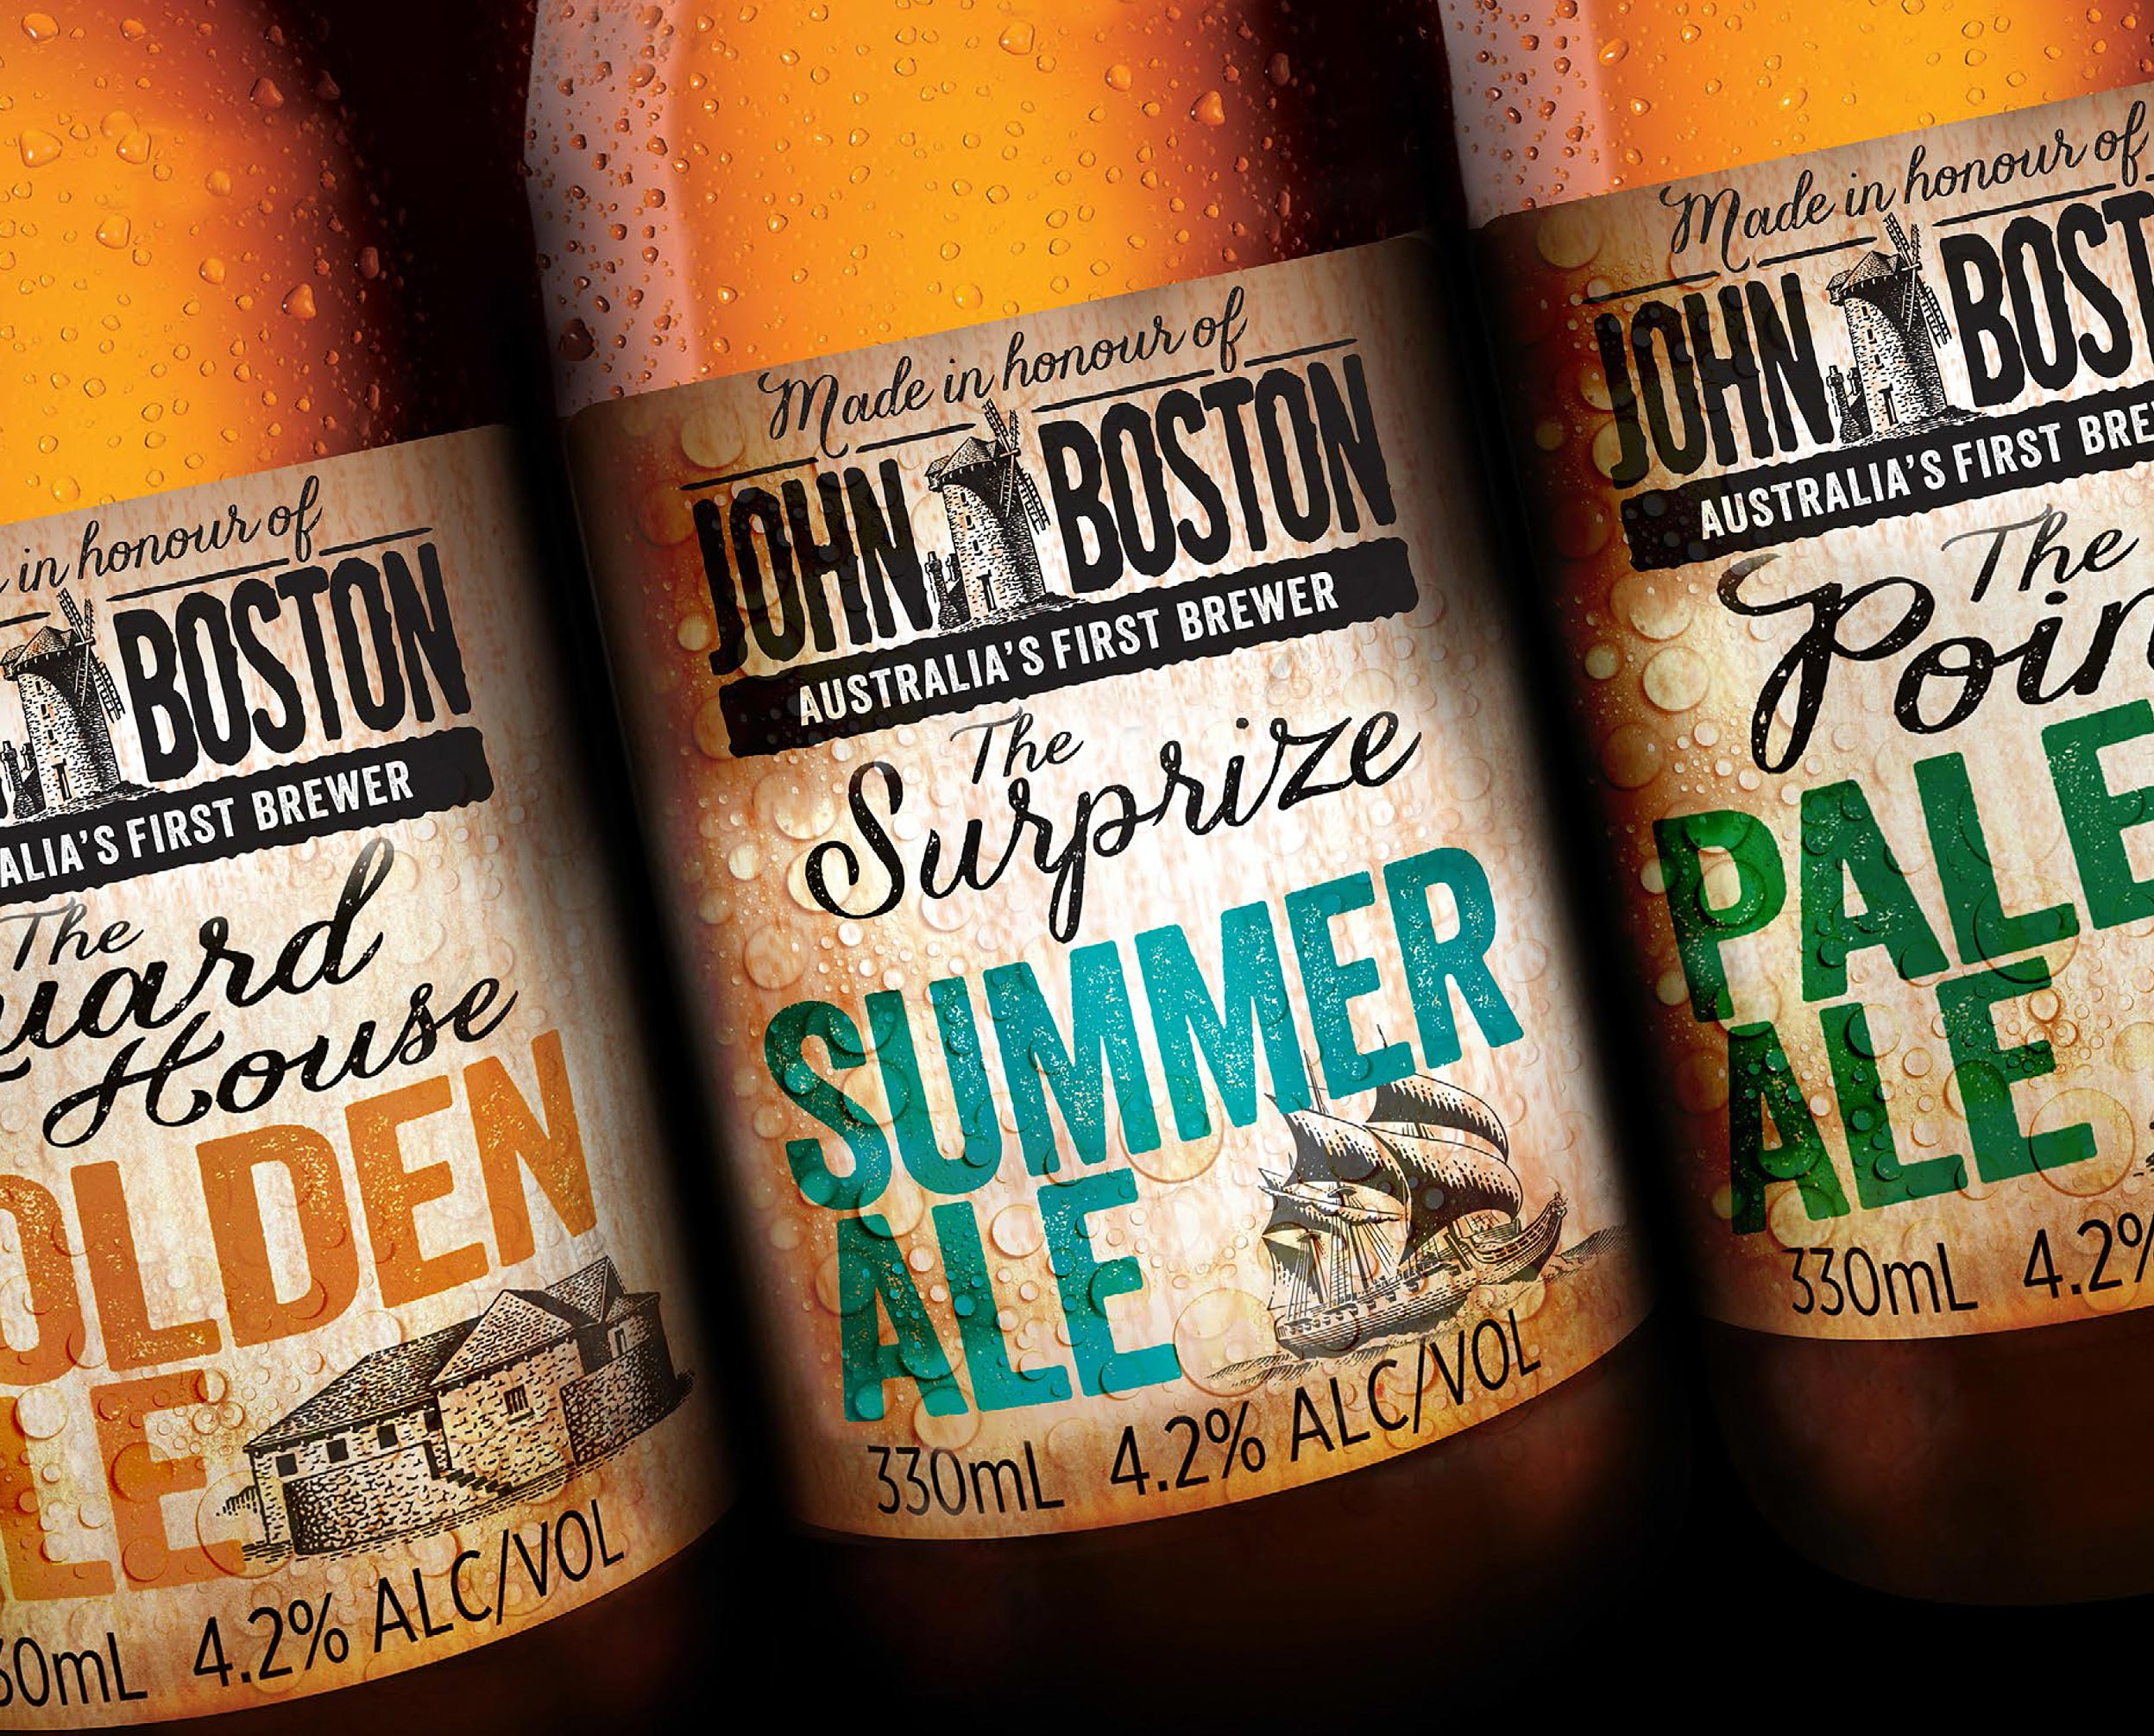 John Boston refresh & extension